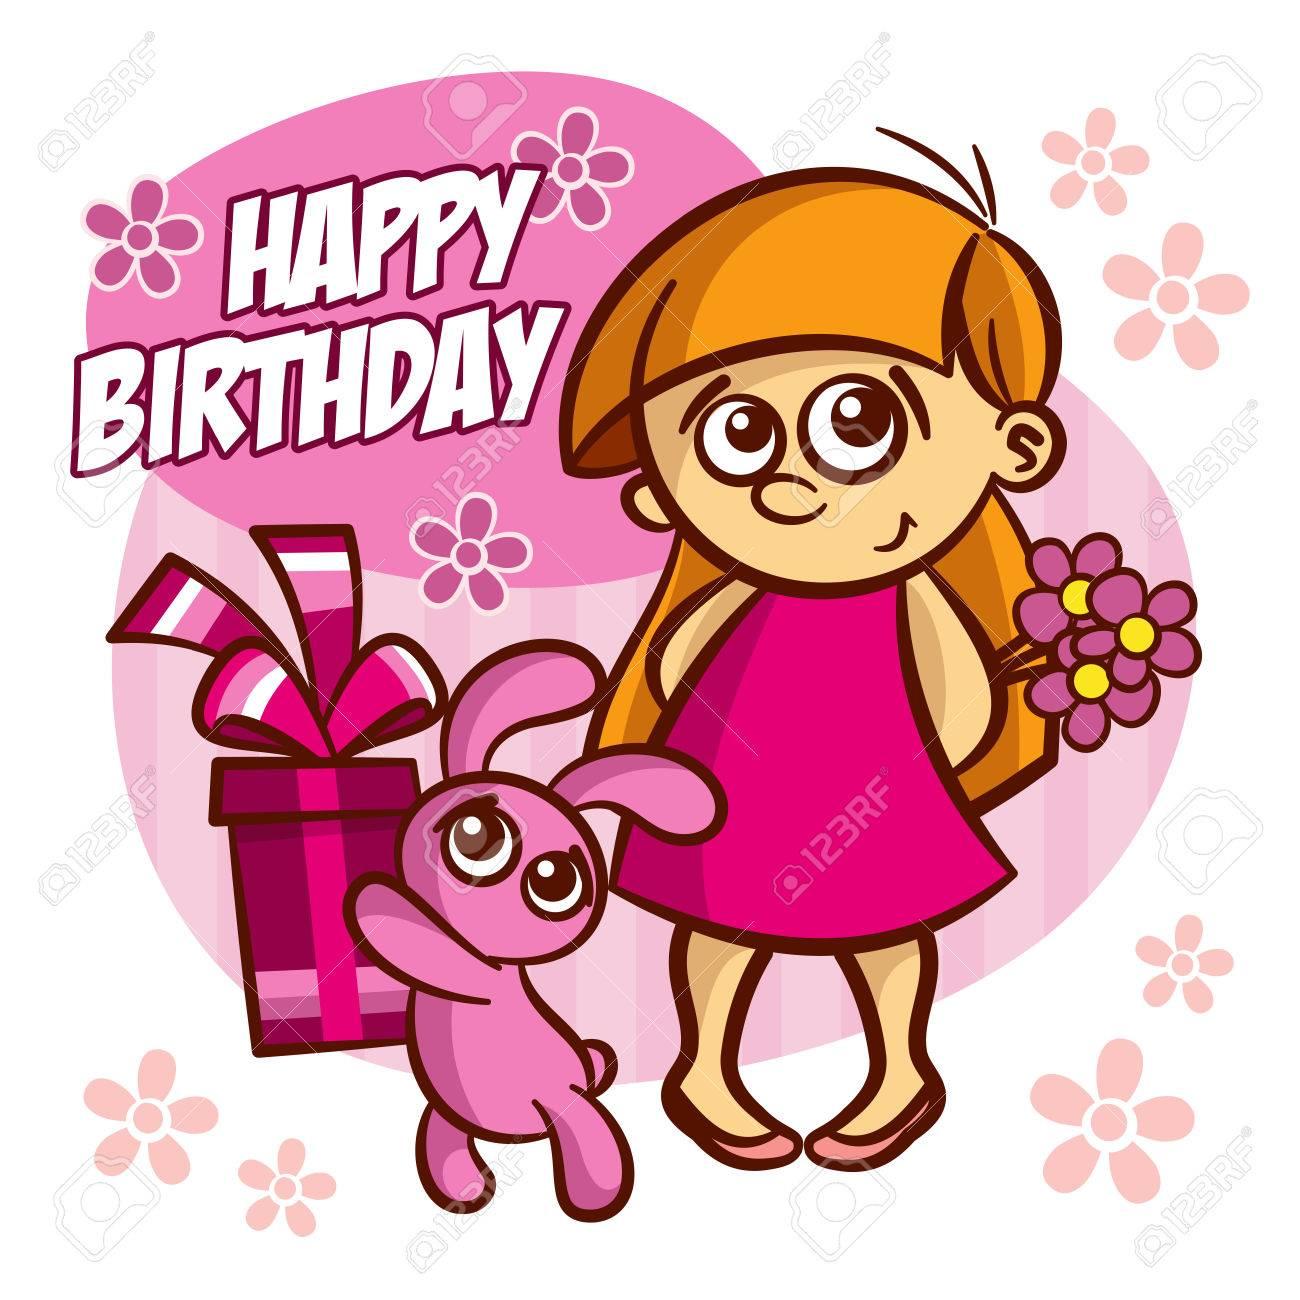 Happy birthday card girl and bunny vector clipart royalty free happy birthday card girl and bunny vector clipart stock vector 66581935 bookmarktalkfo Choice Image